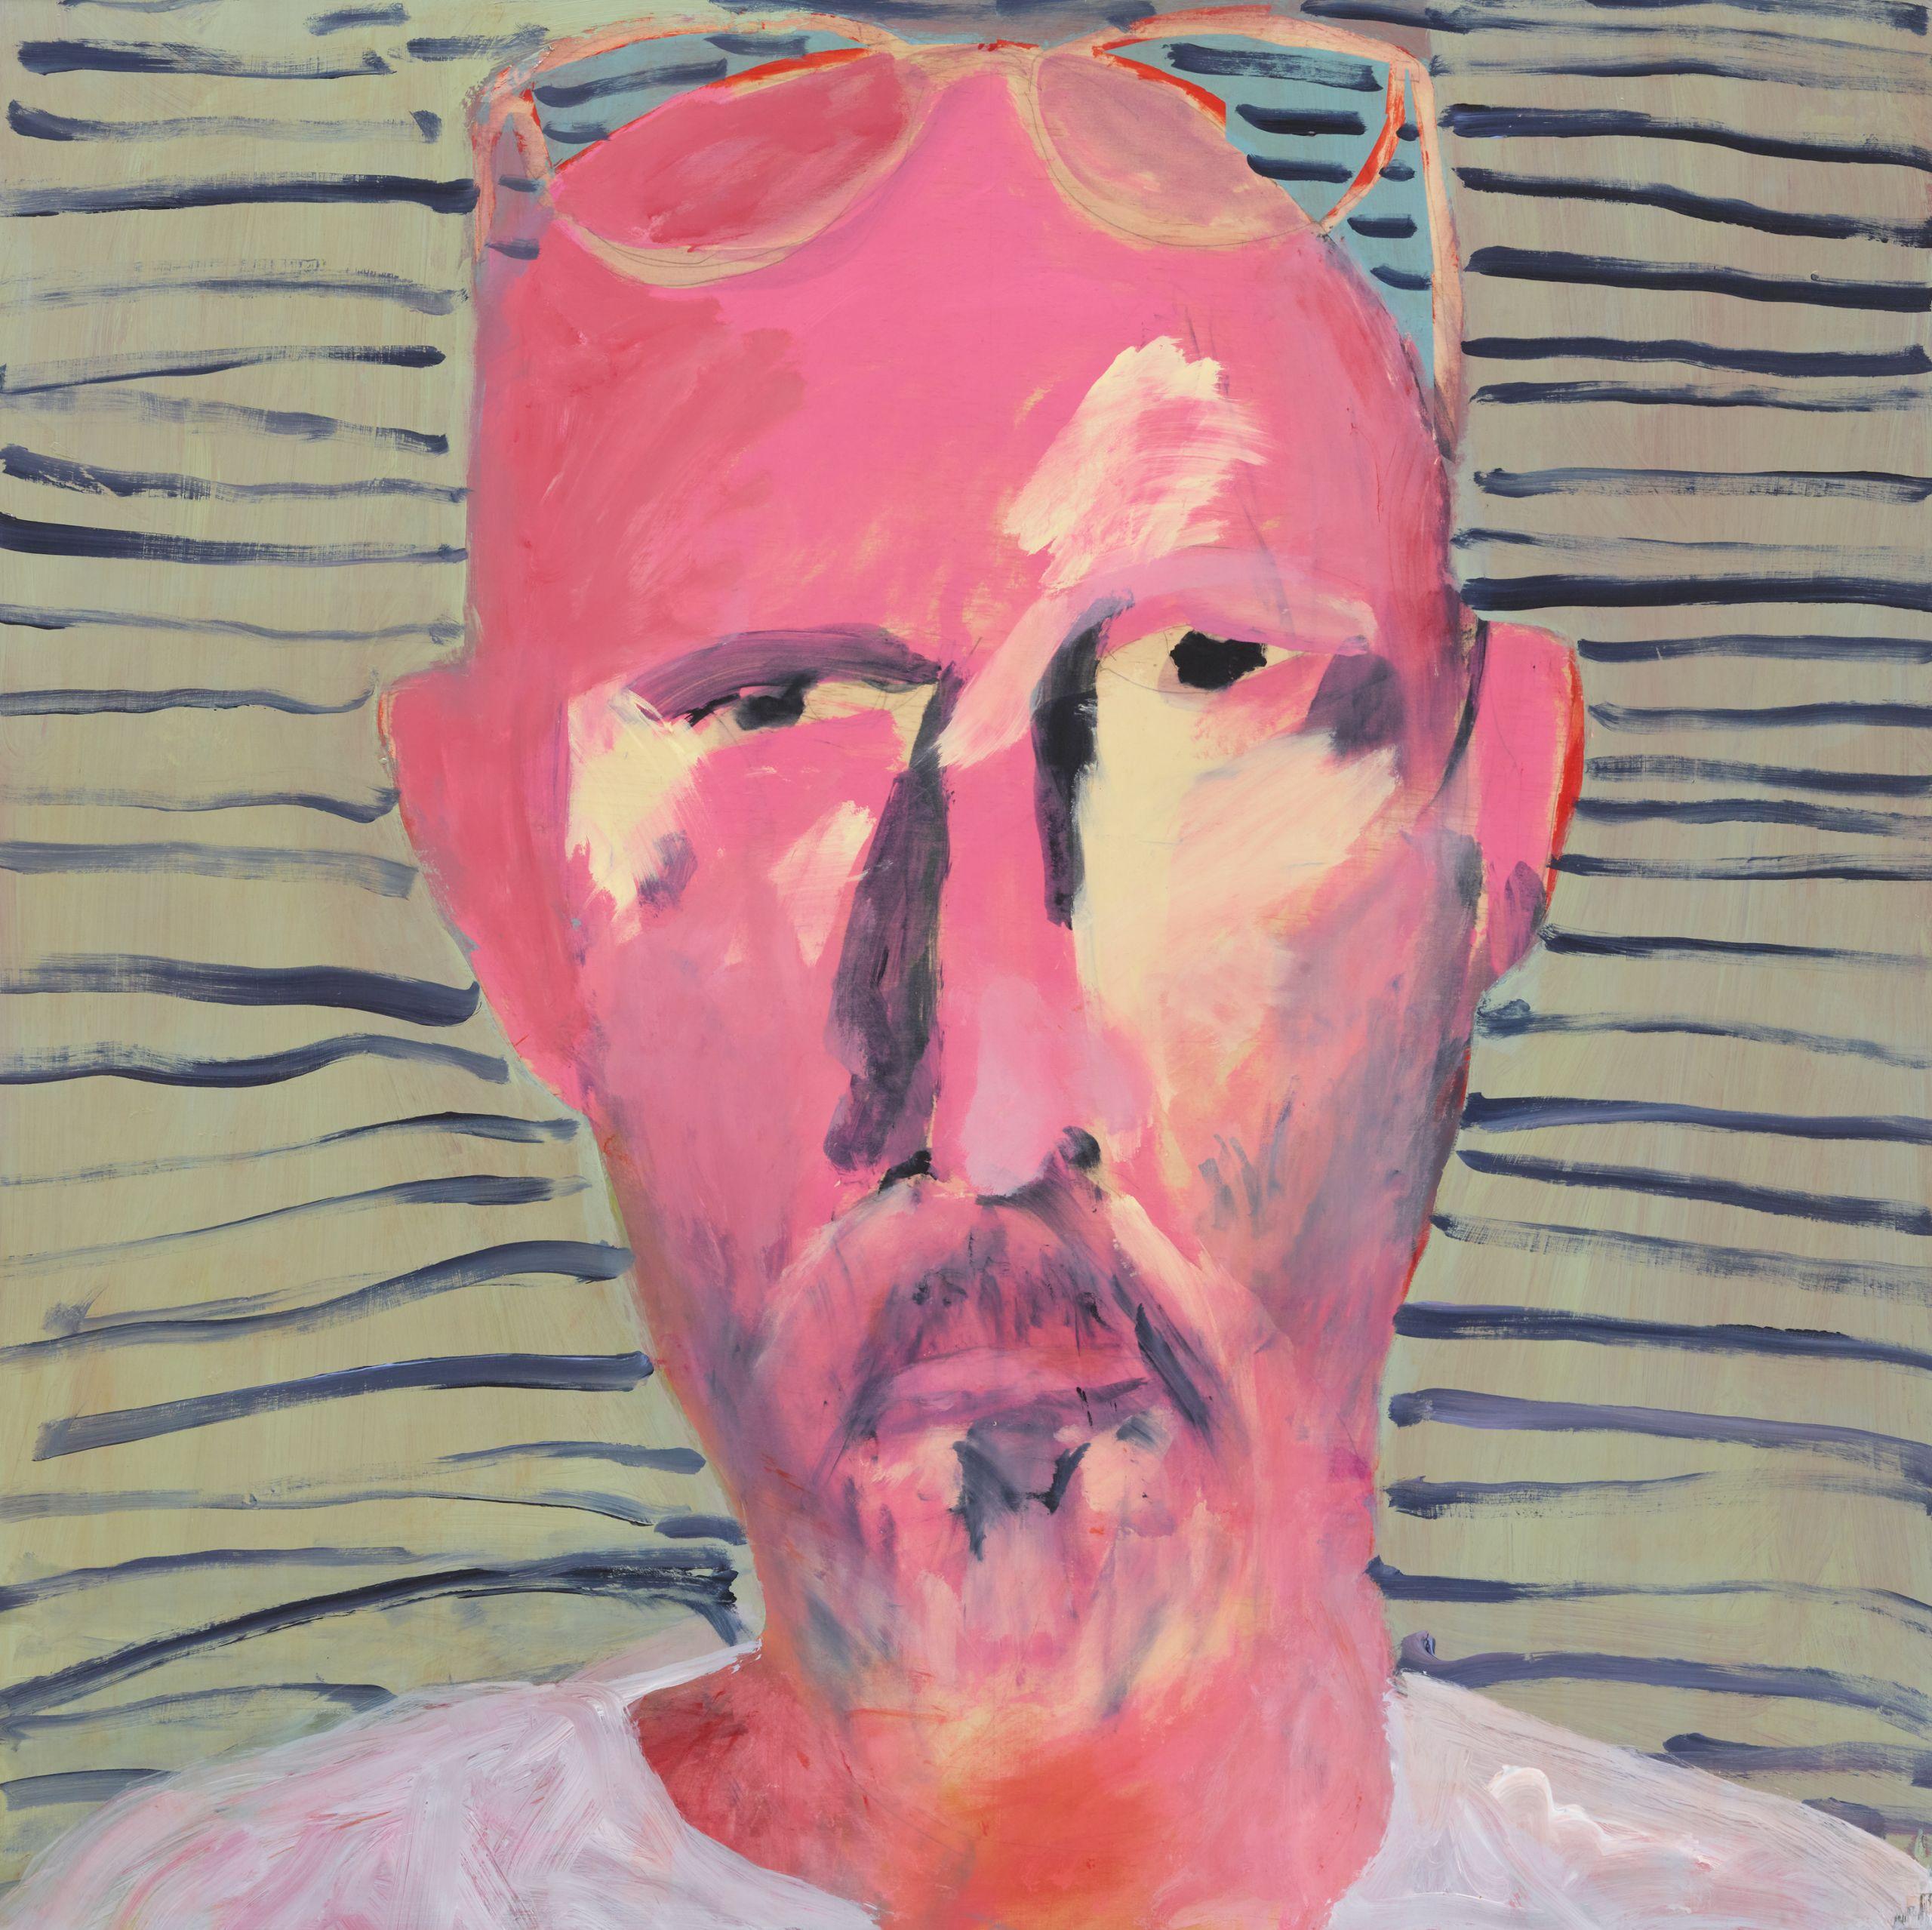 Archibald Prize finalist Peter Berner